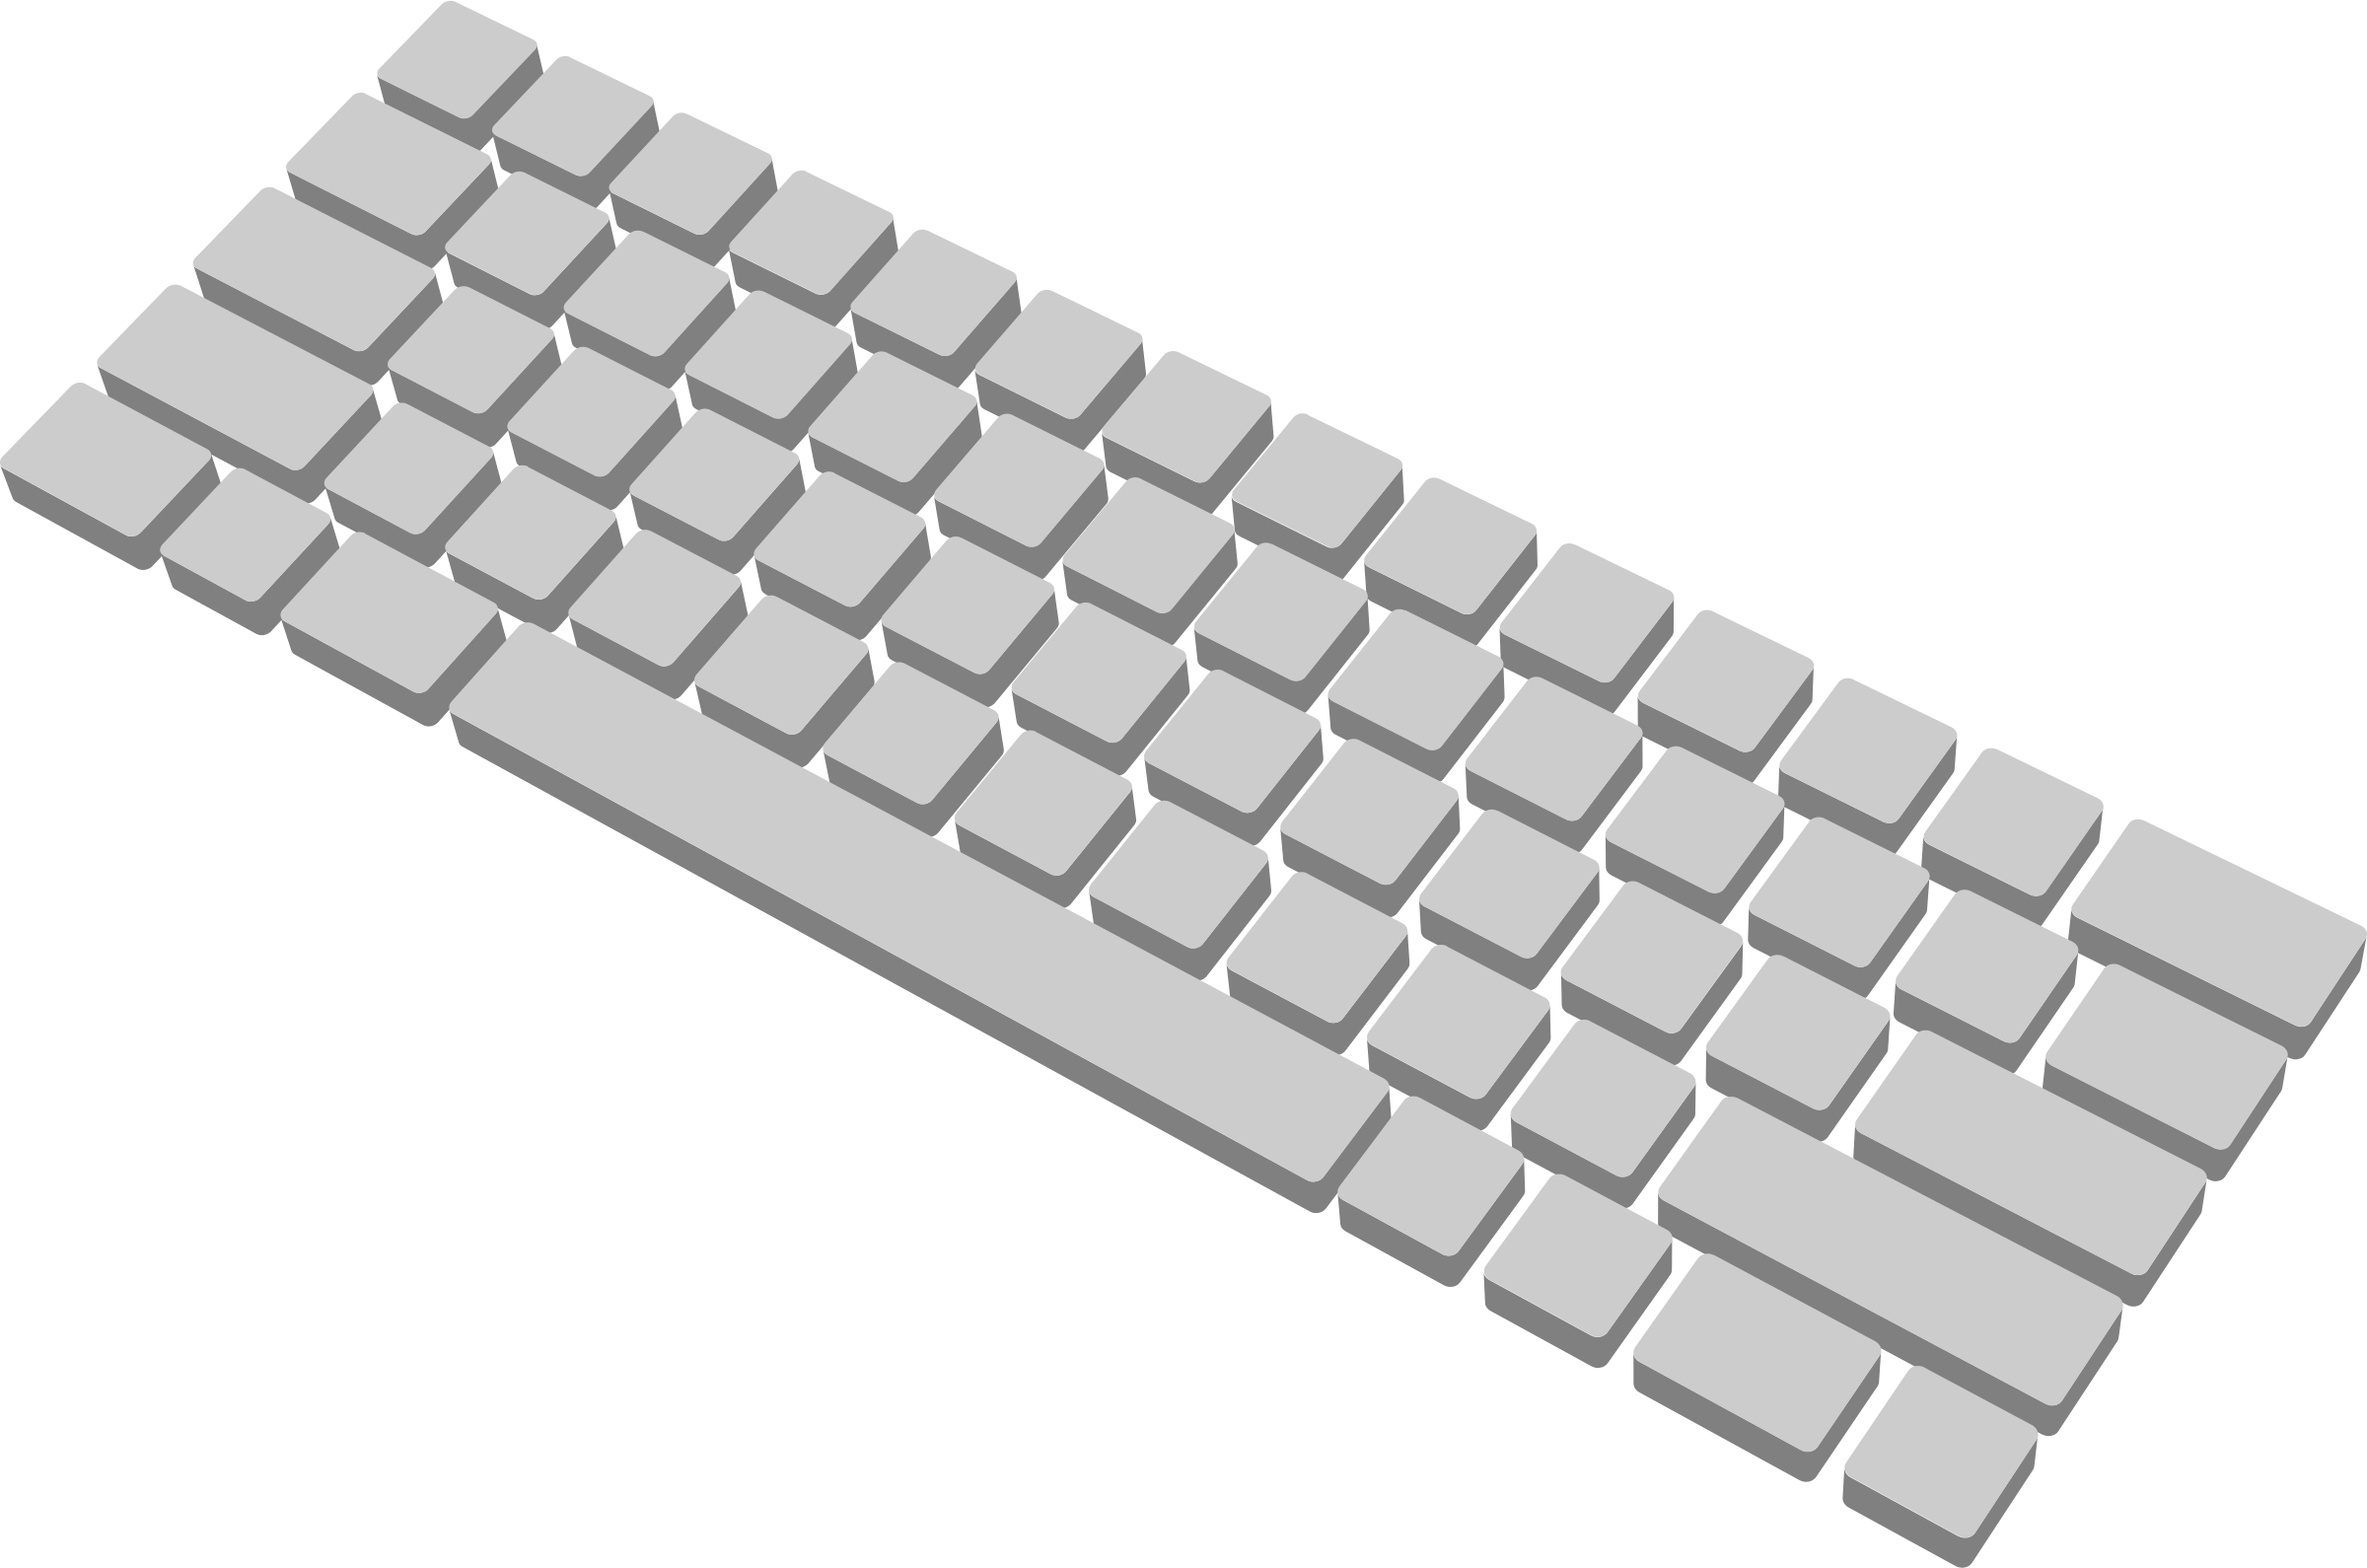 3d keyboard computer clipart download 3d keyboard computer clipart - ClipartFest download